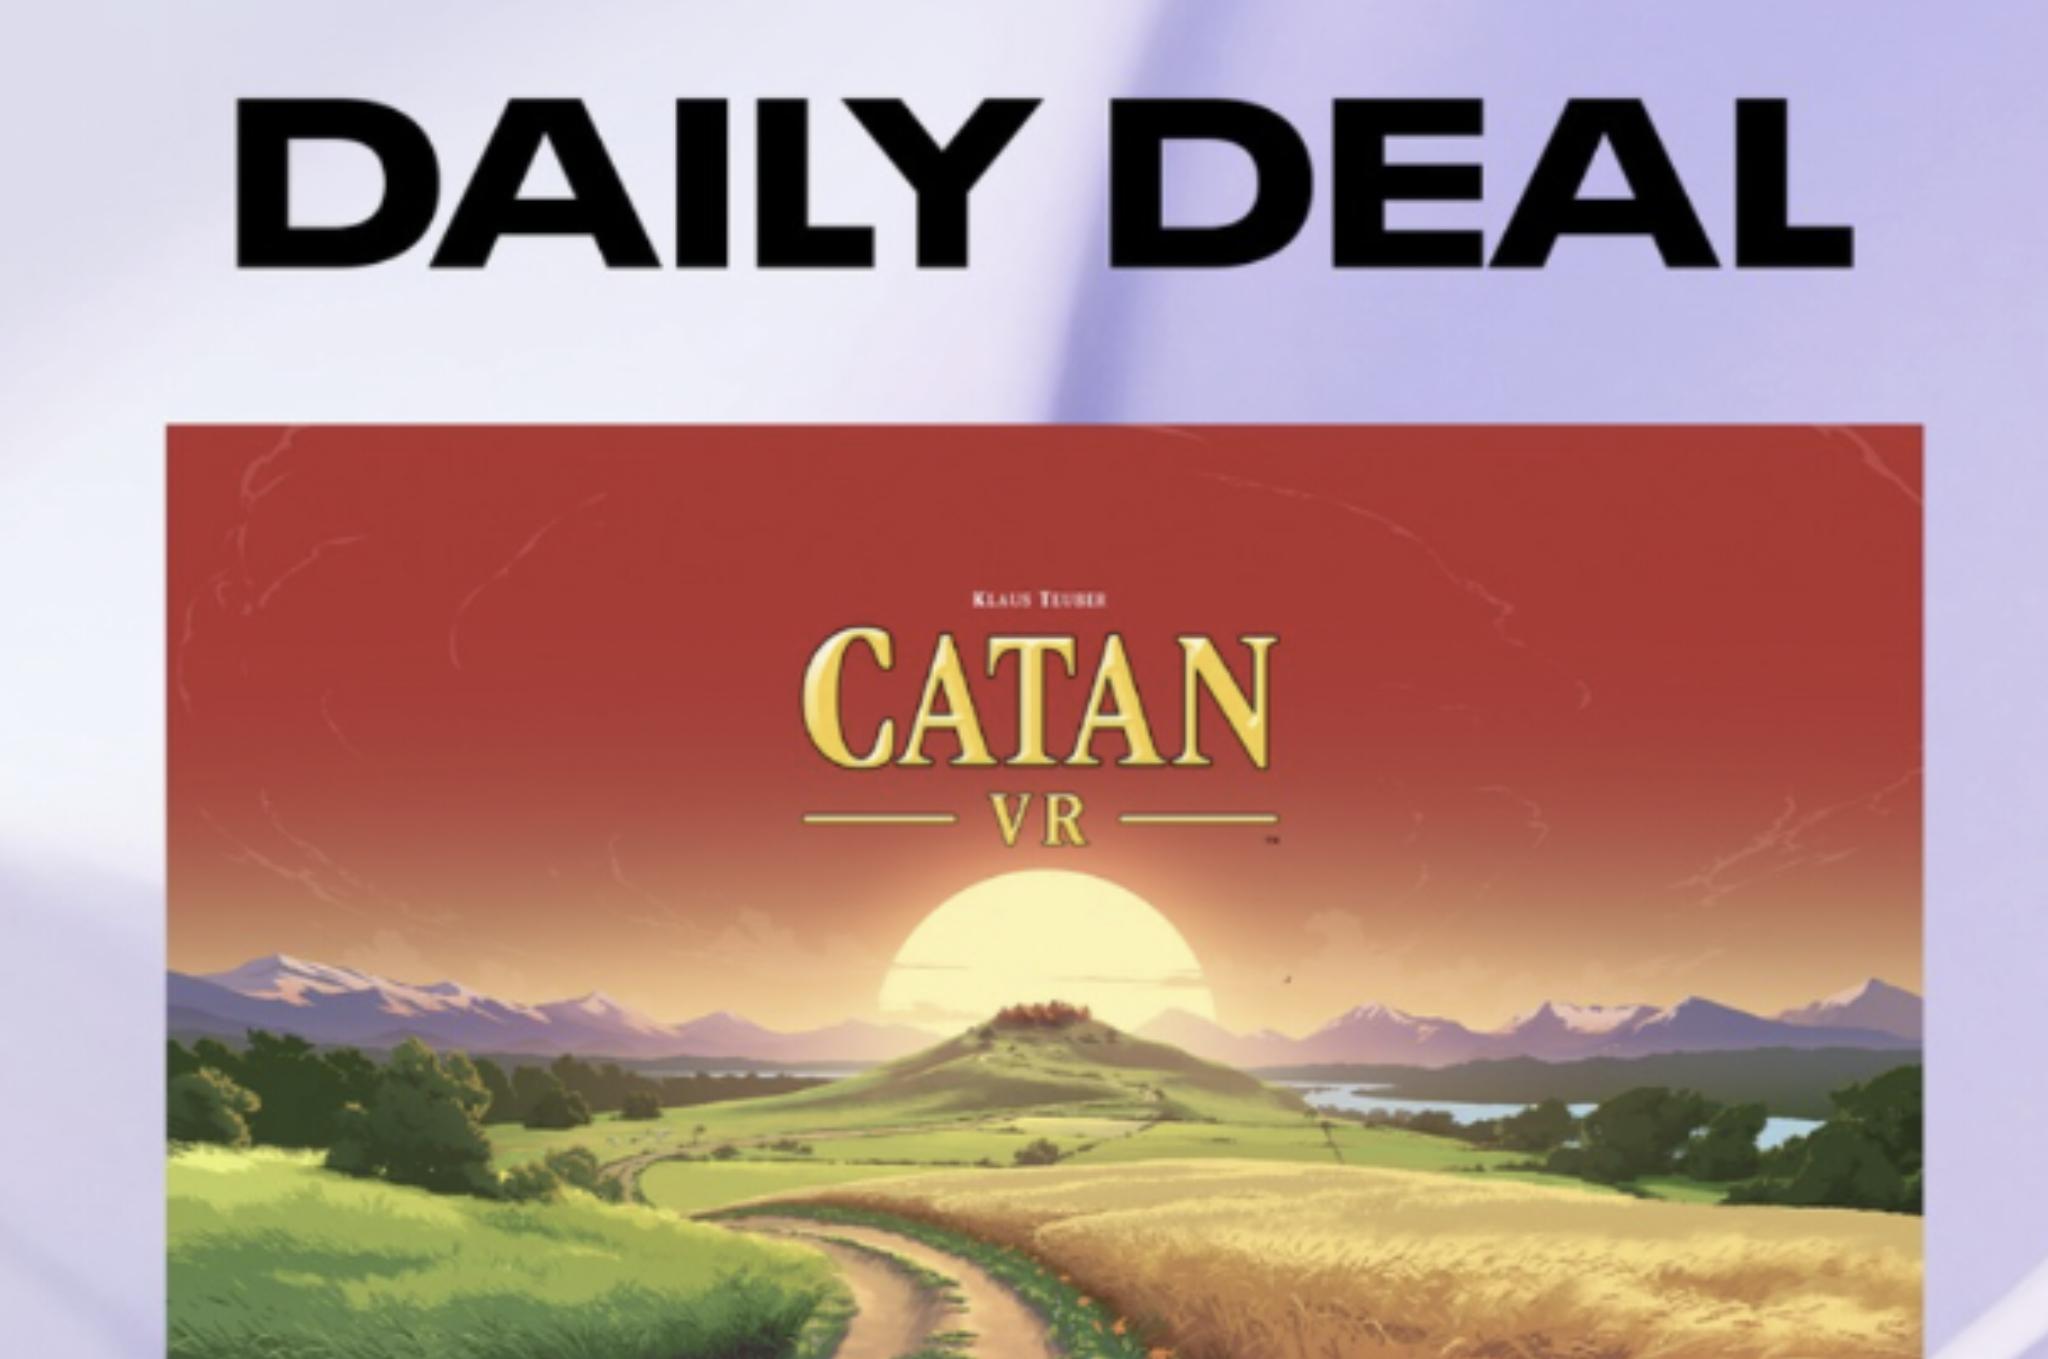 Oculus VR Daily Deal - Catan VR - £8.99 @ Oculus